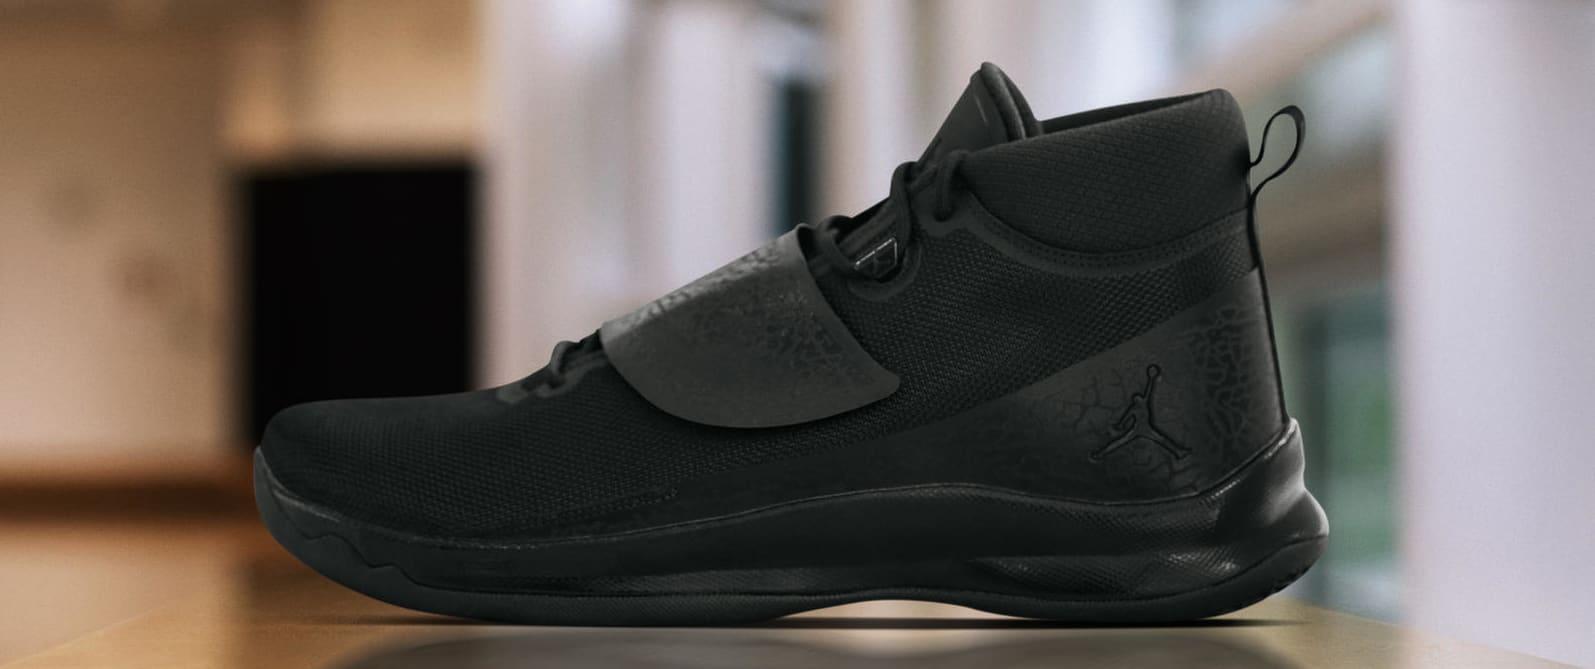 Air Jordan Super.Fly 5 PO